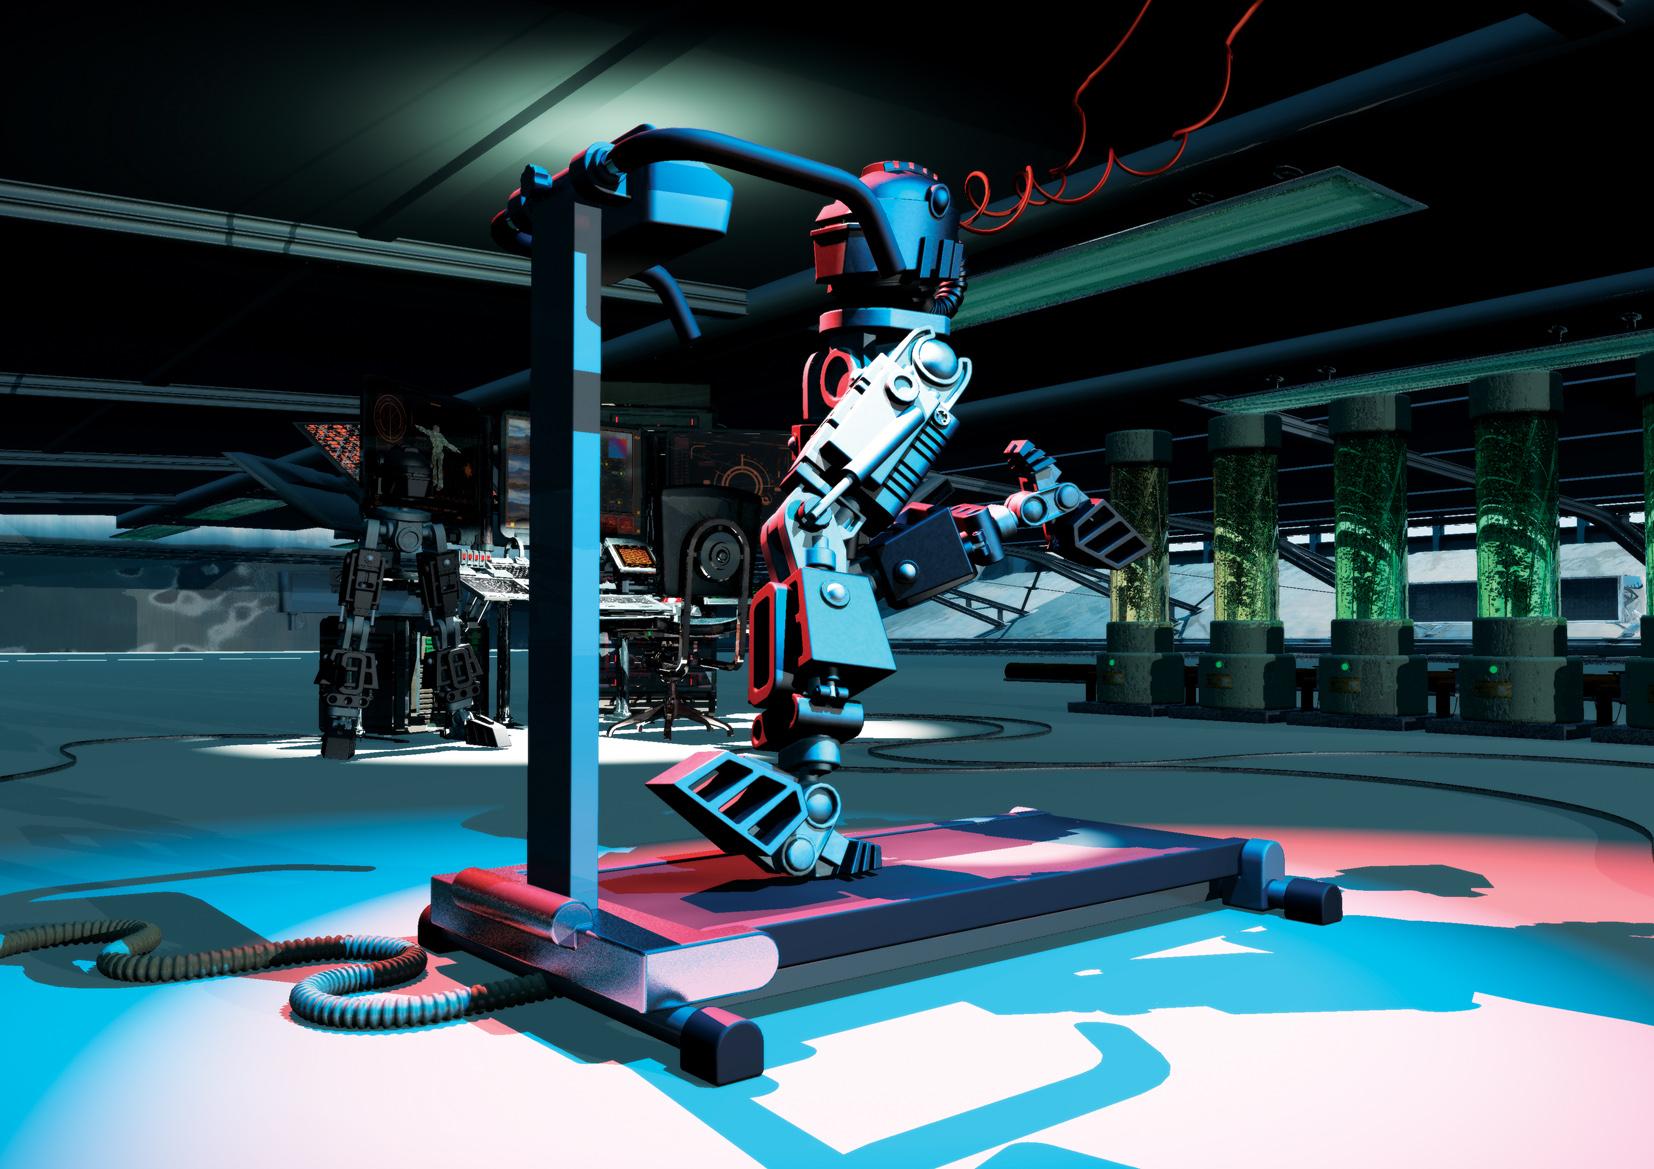 Running Robot / Men's Health magazine